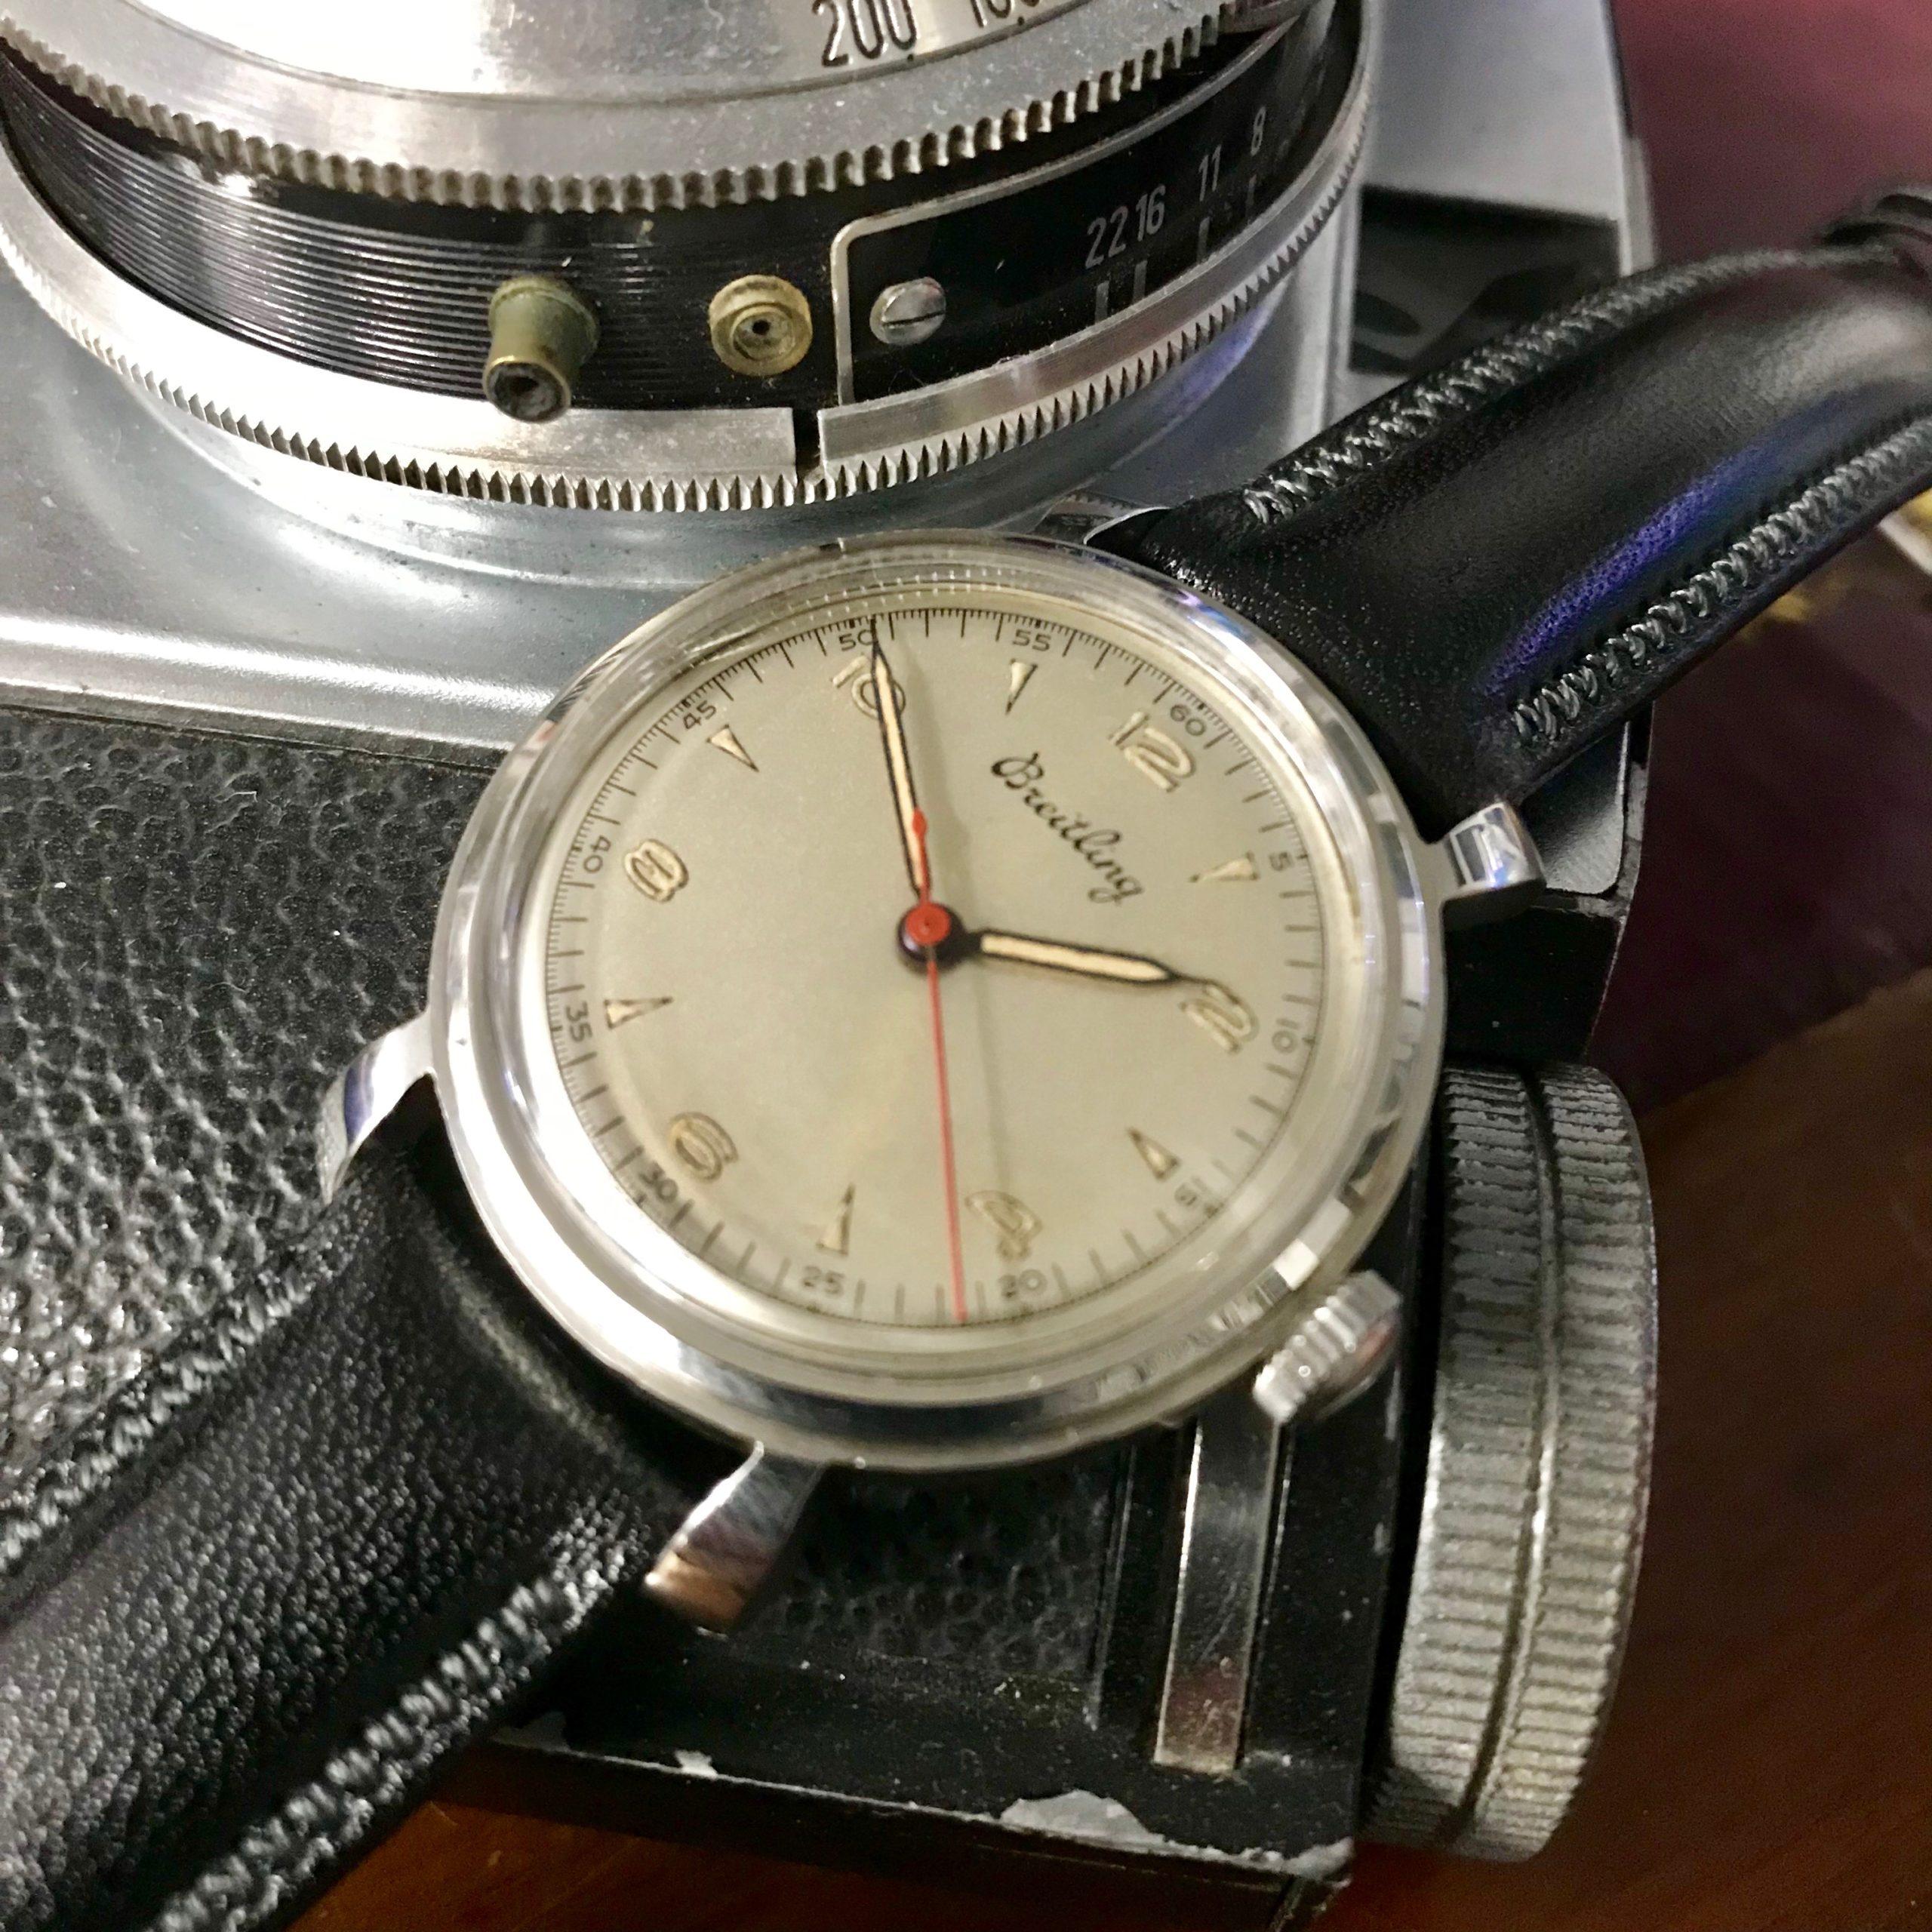 Marques de montres de luxe: Breitling.